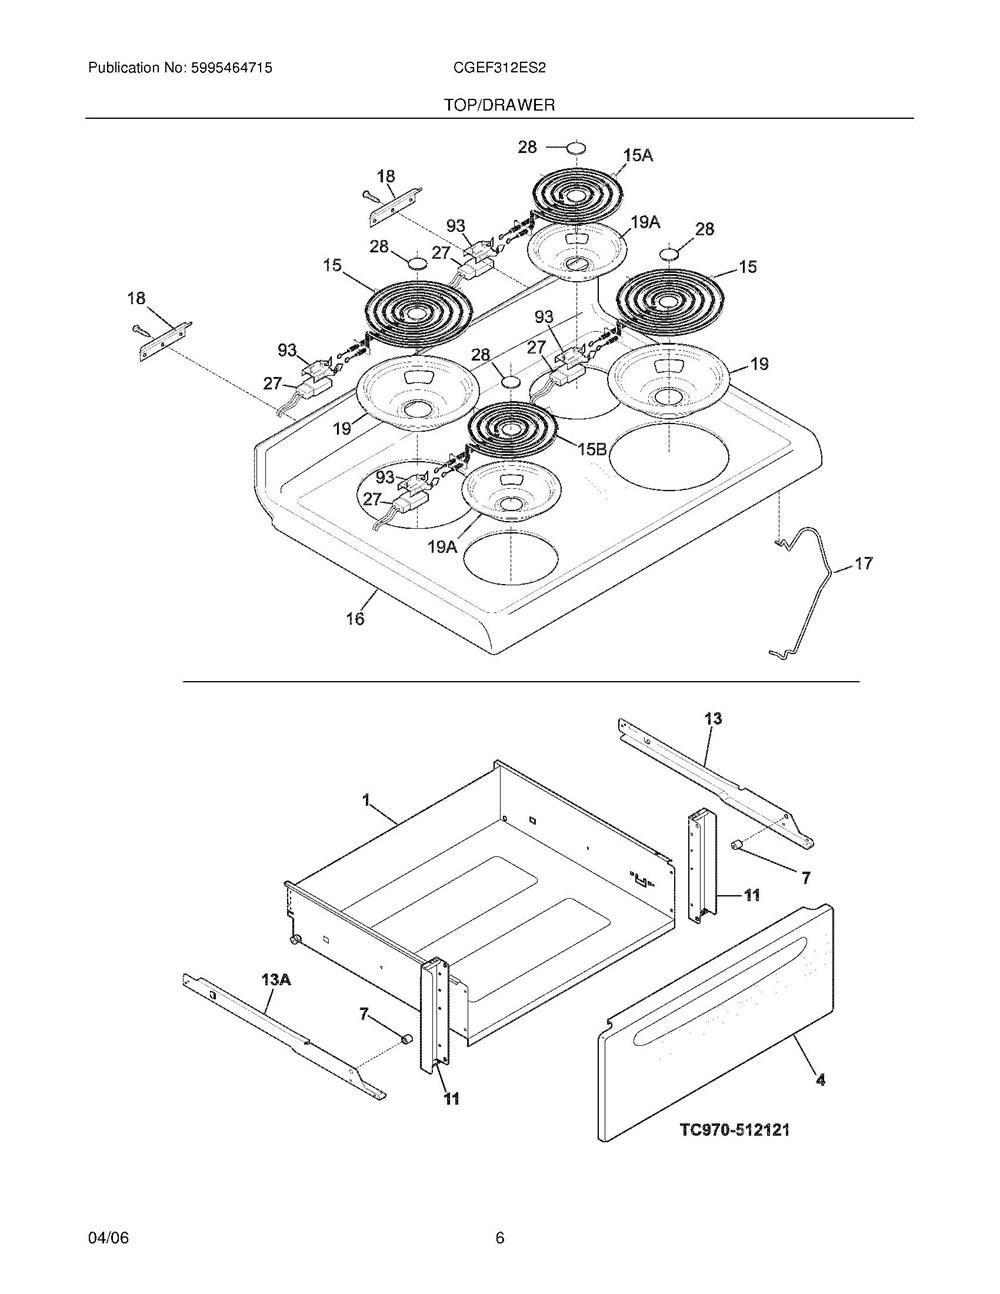 Cgef312es2 Frigidaire Company Appliance Parts Backguard 05body 07top Drawer 09door 01cover 10wiring Diagram